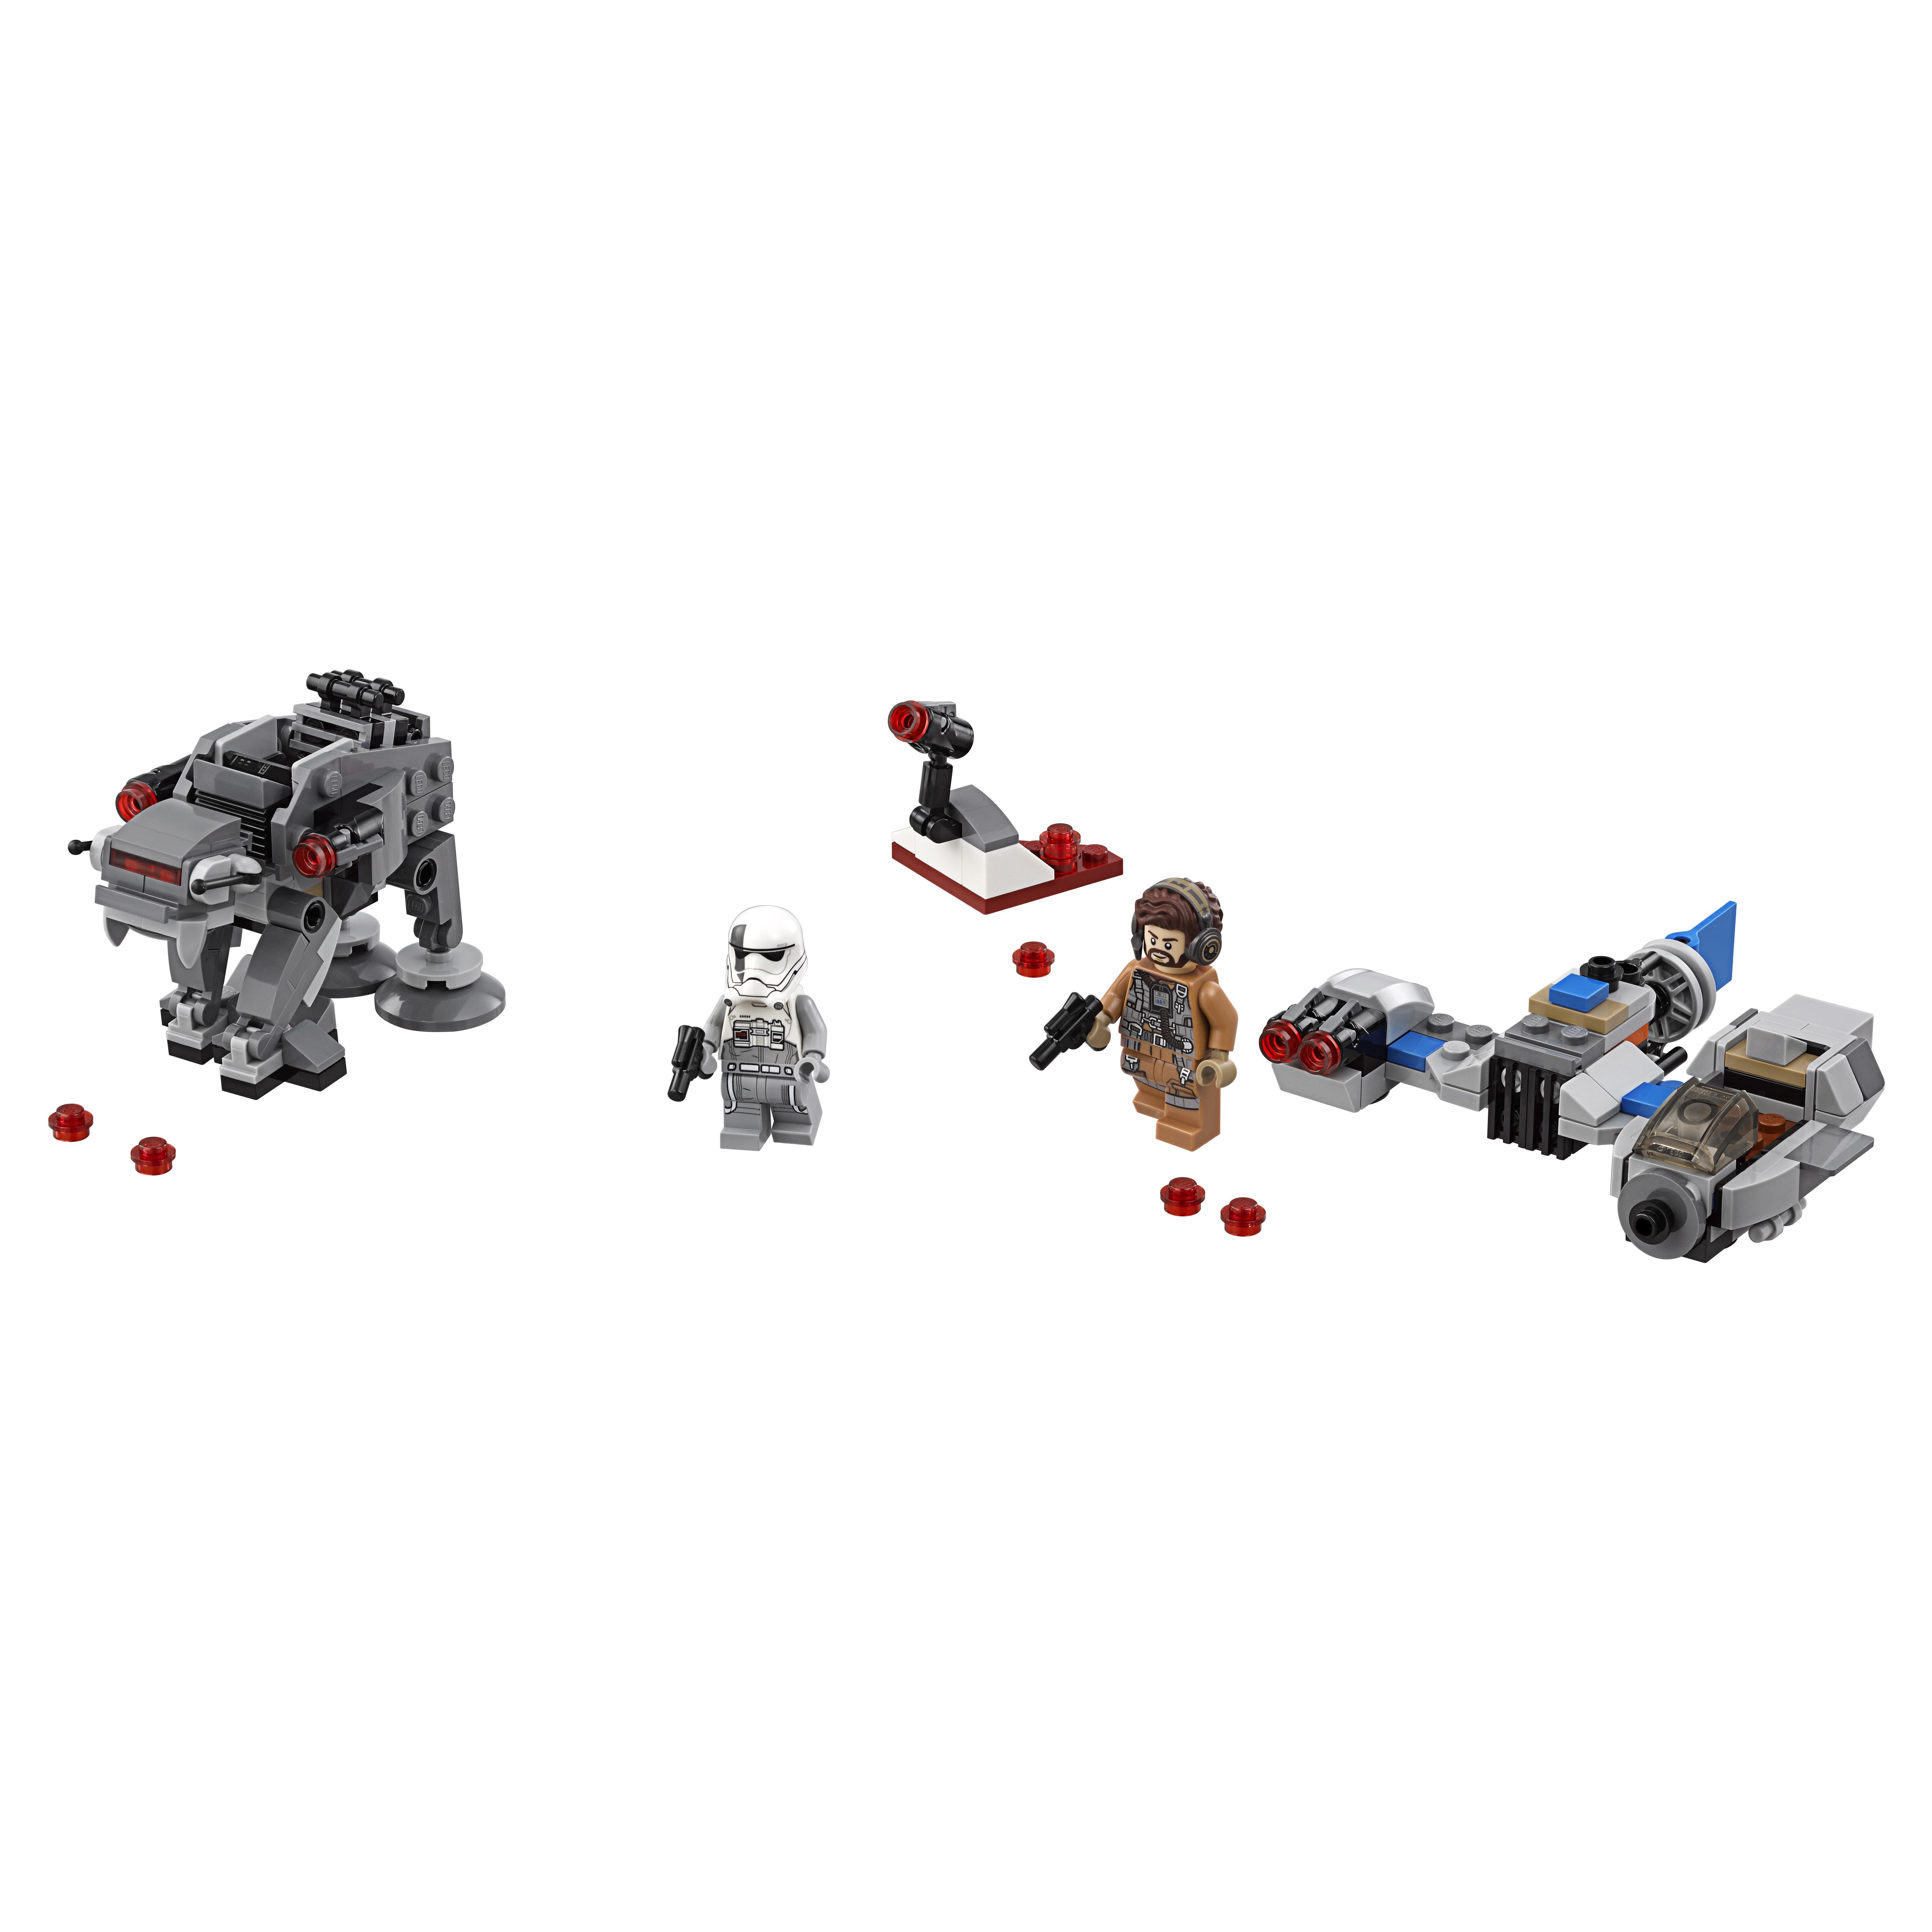 Конструктор LEGO Star Wars Бой пехотинцев Первого